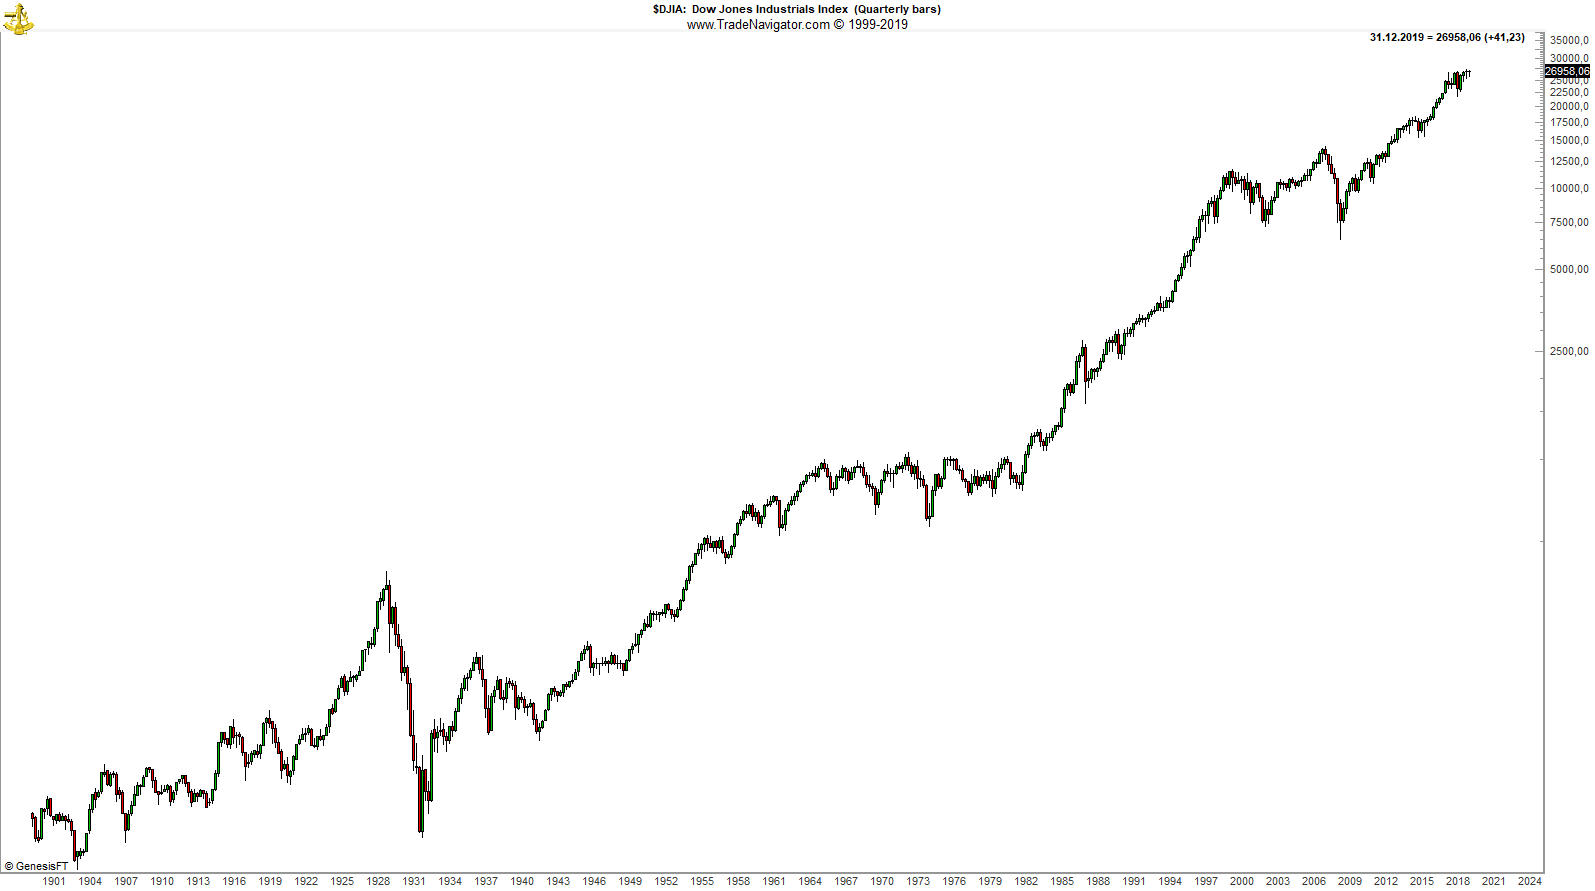 Dow_Jones_Industrial_Average_Quaterly